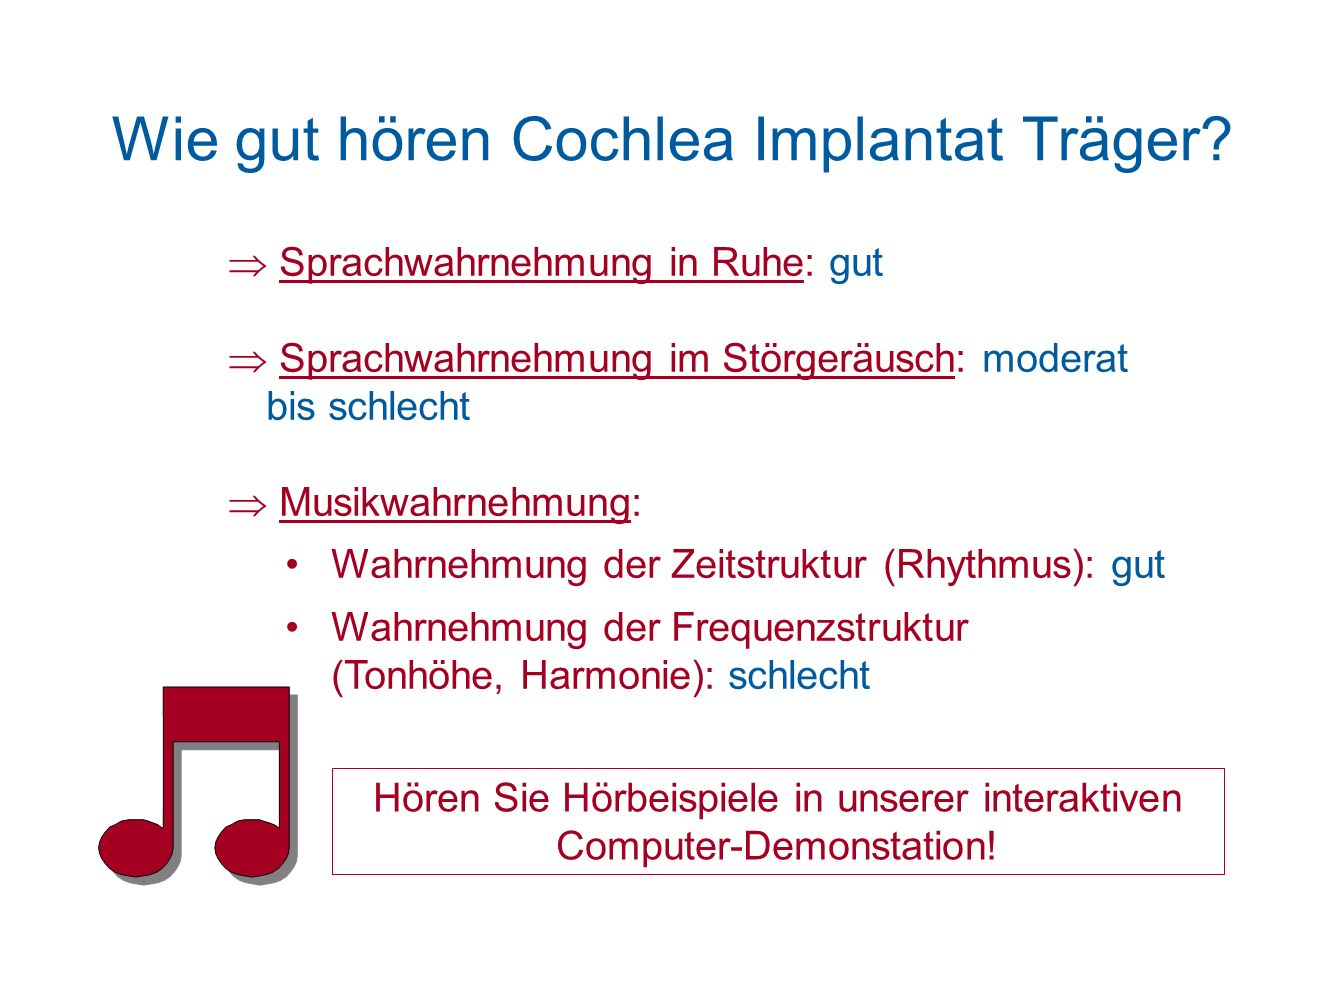 Wie gut hören Cochlea Implantat Träger